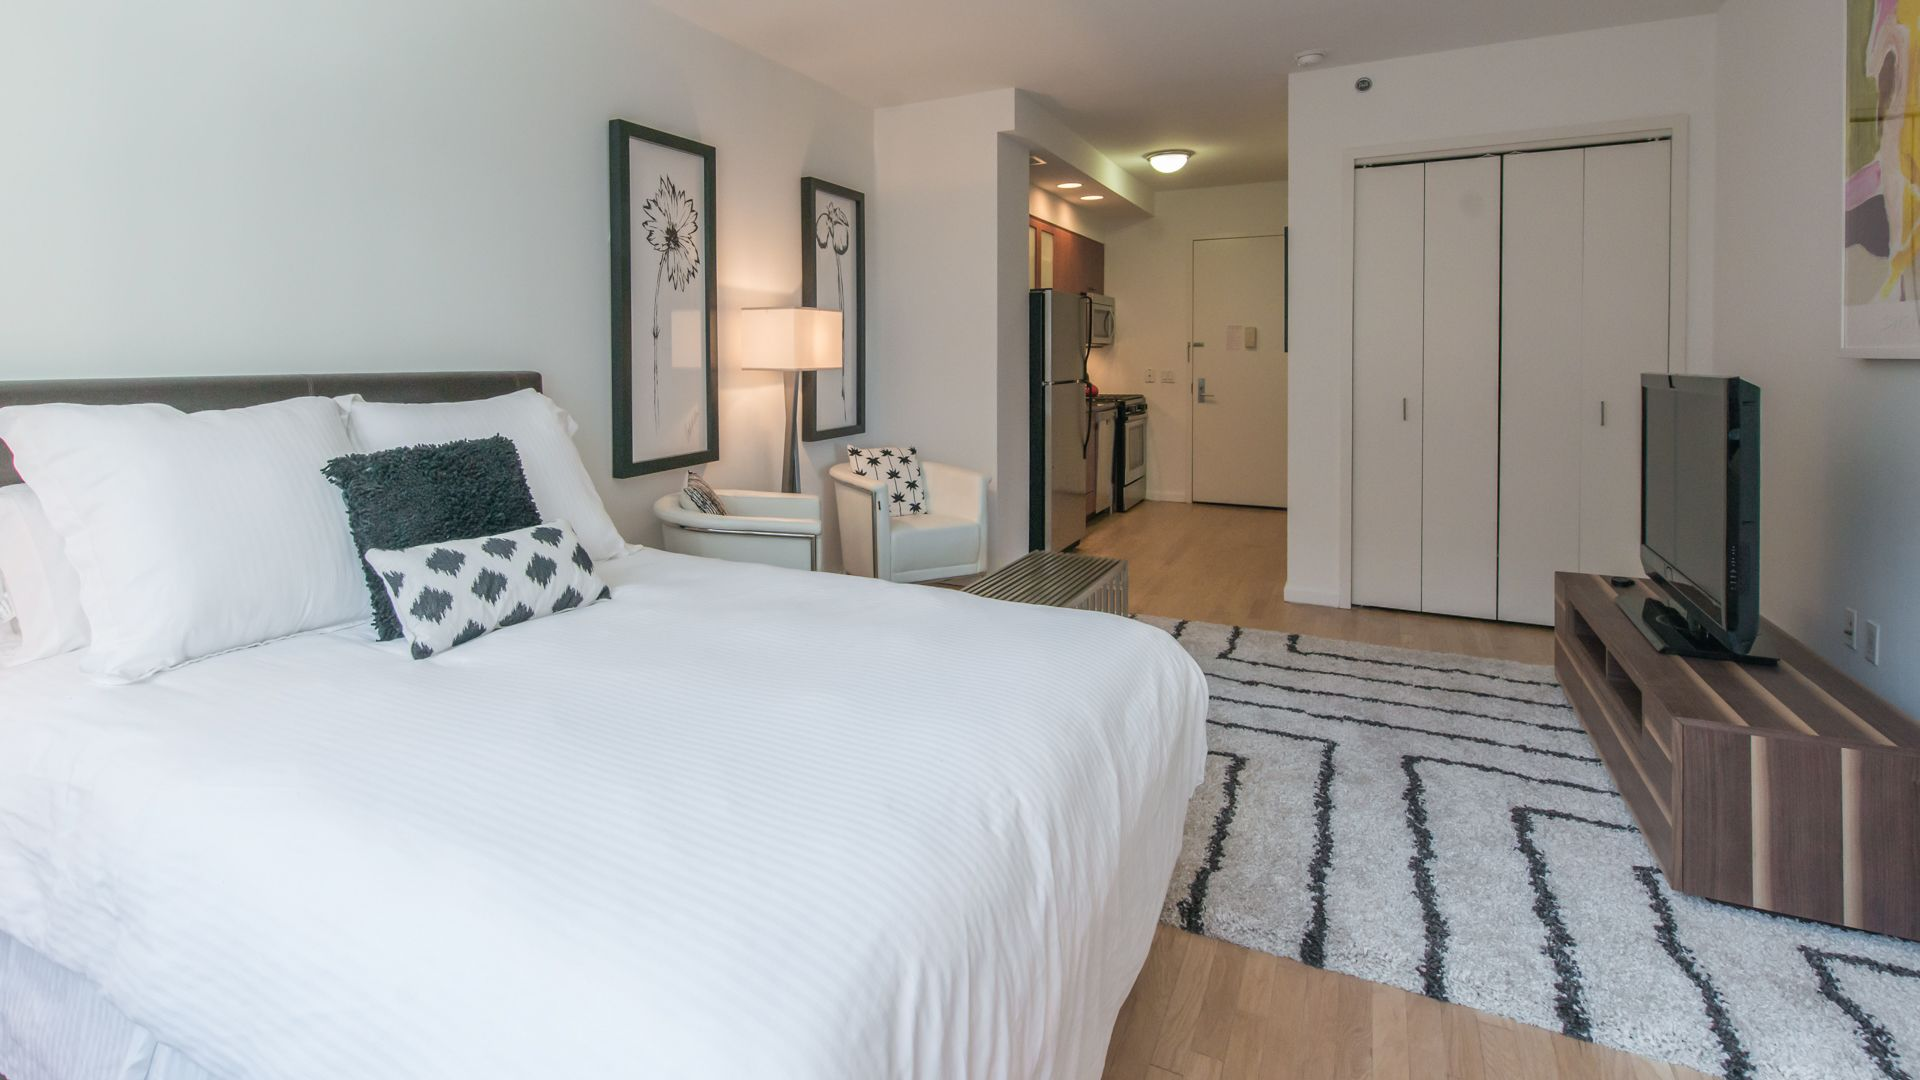 600 Washington Apartments - Studio